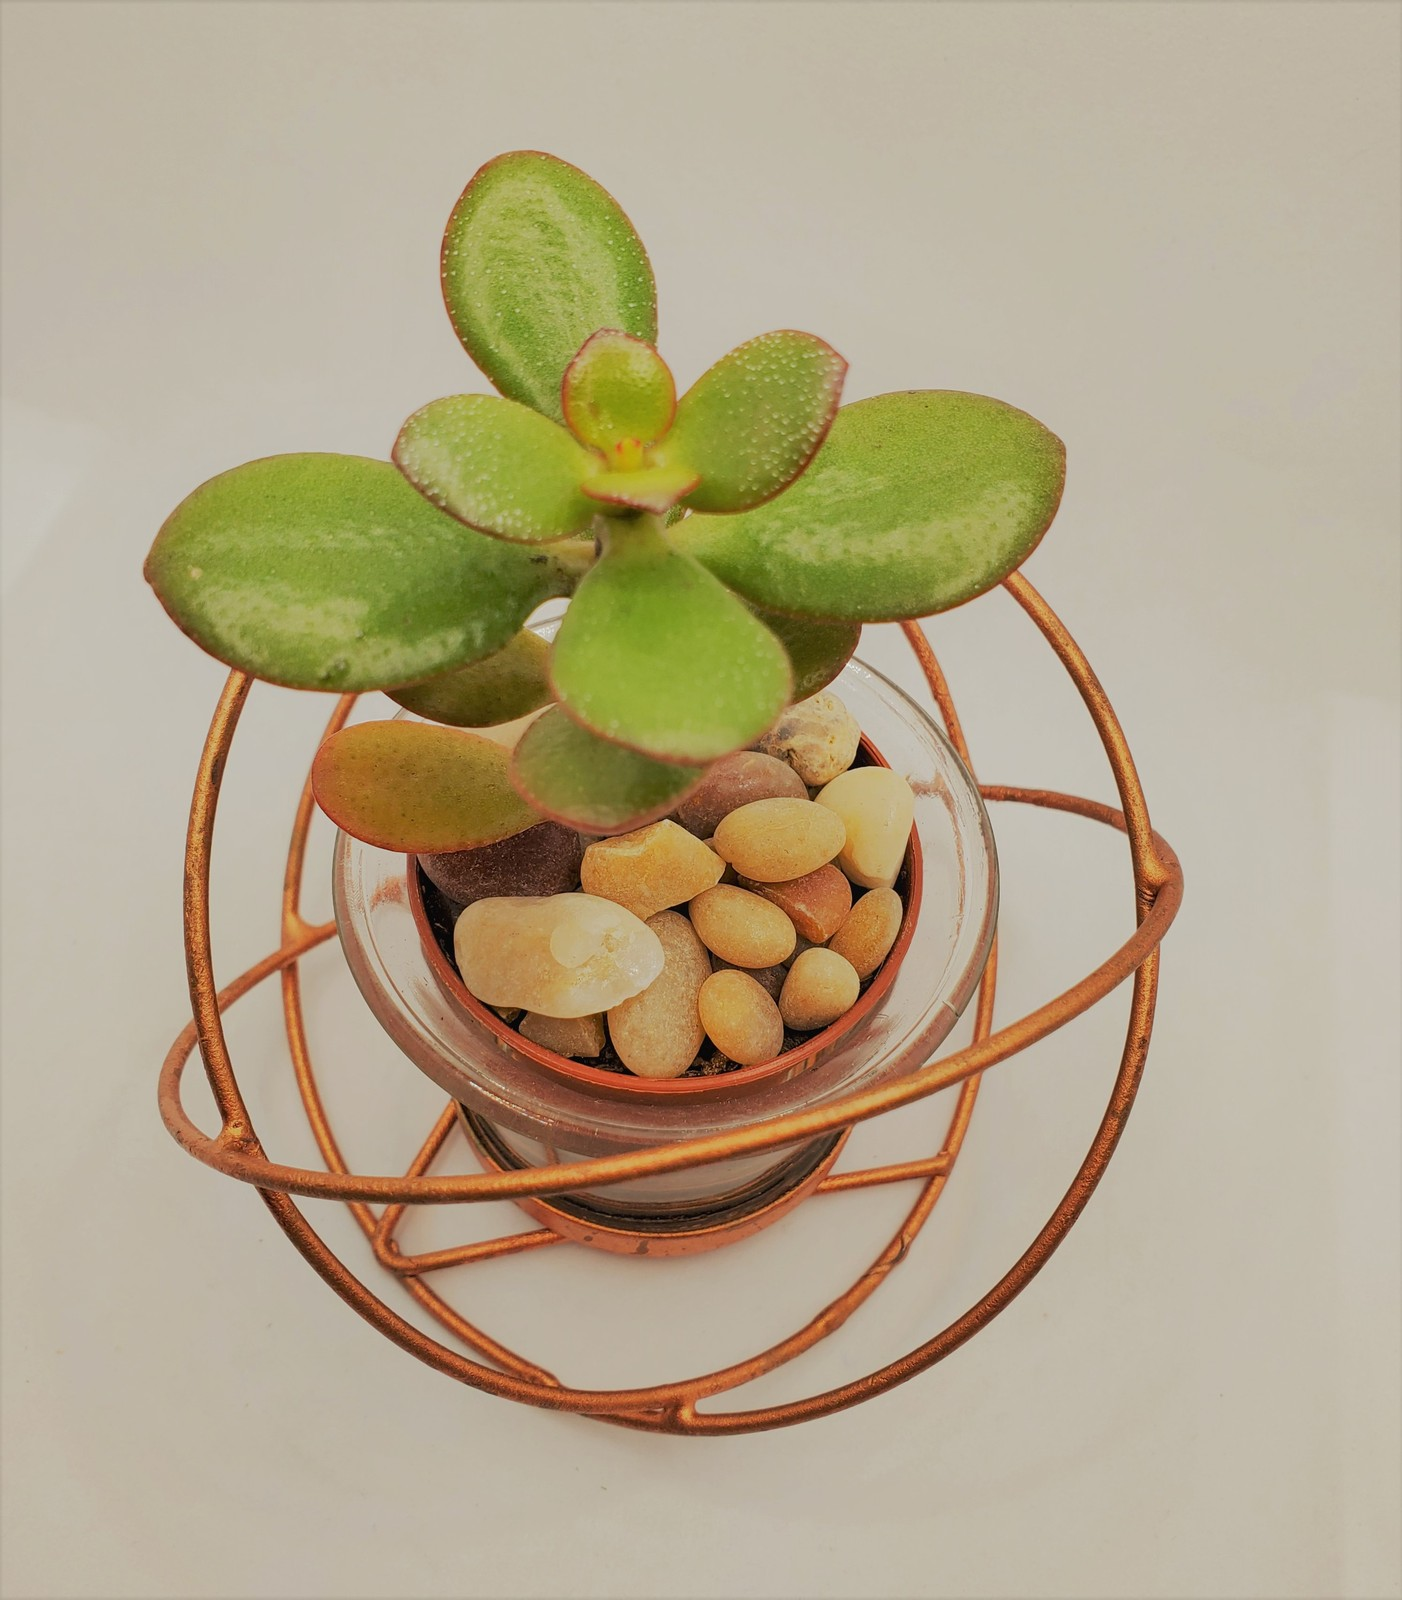 Babyjade rosegoldorbit 1